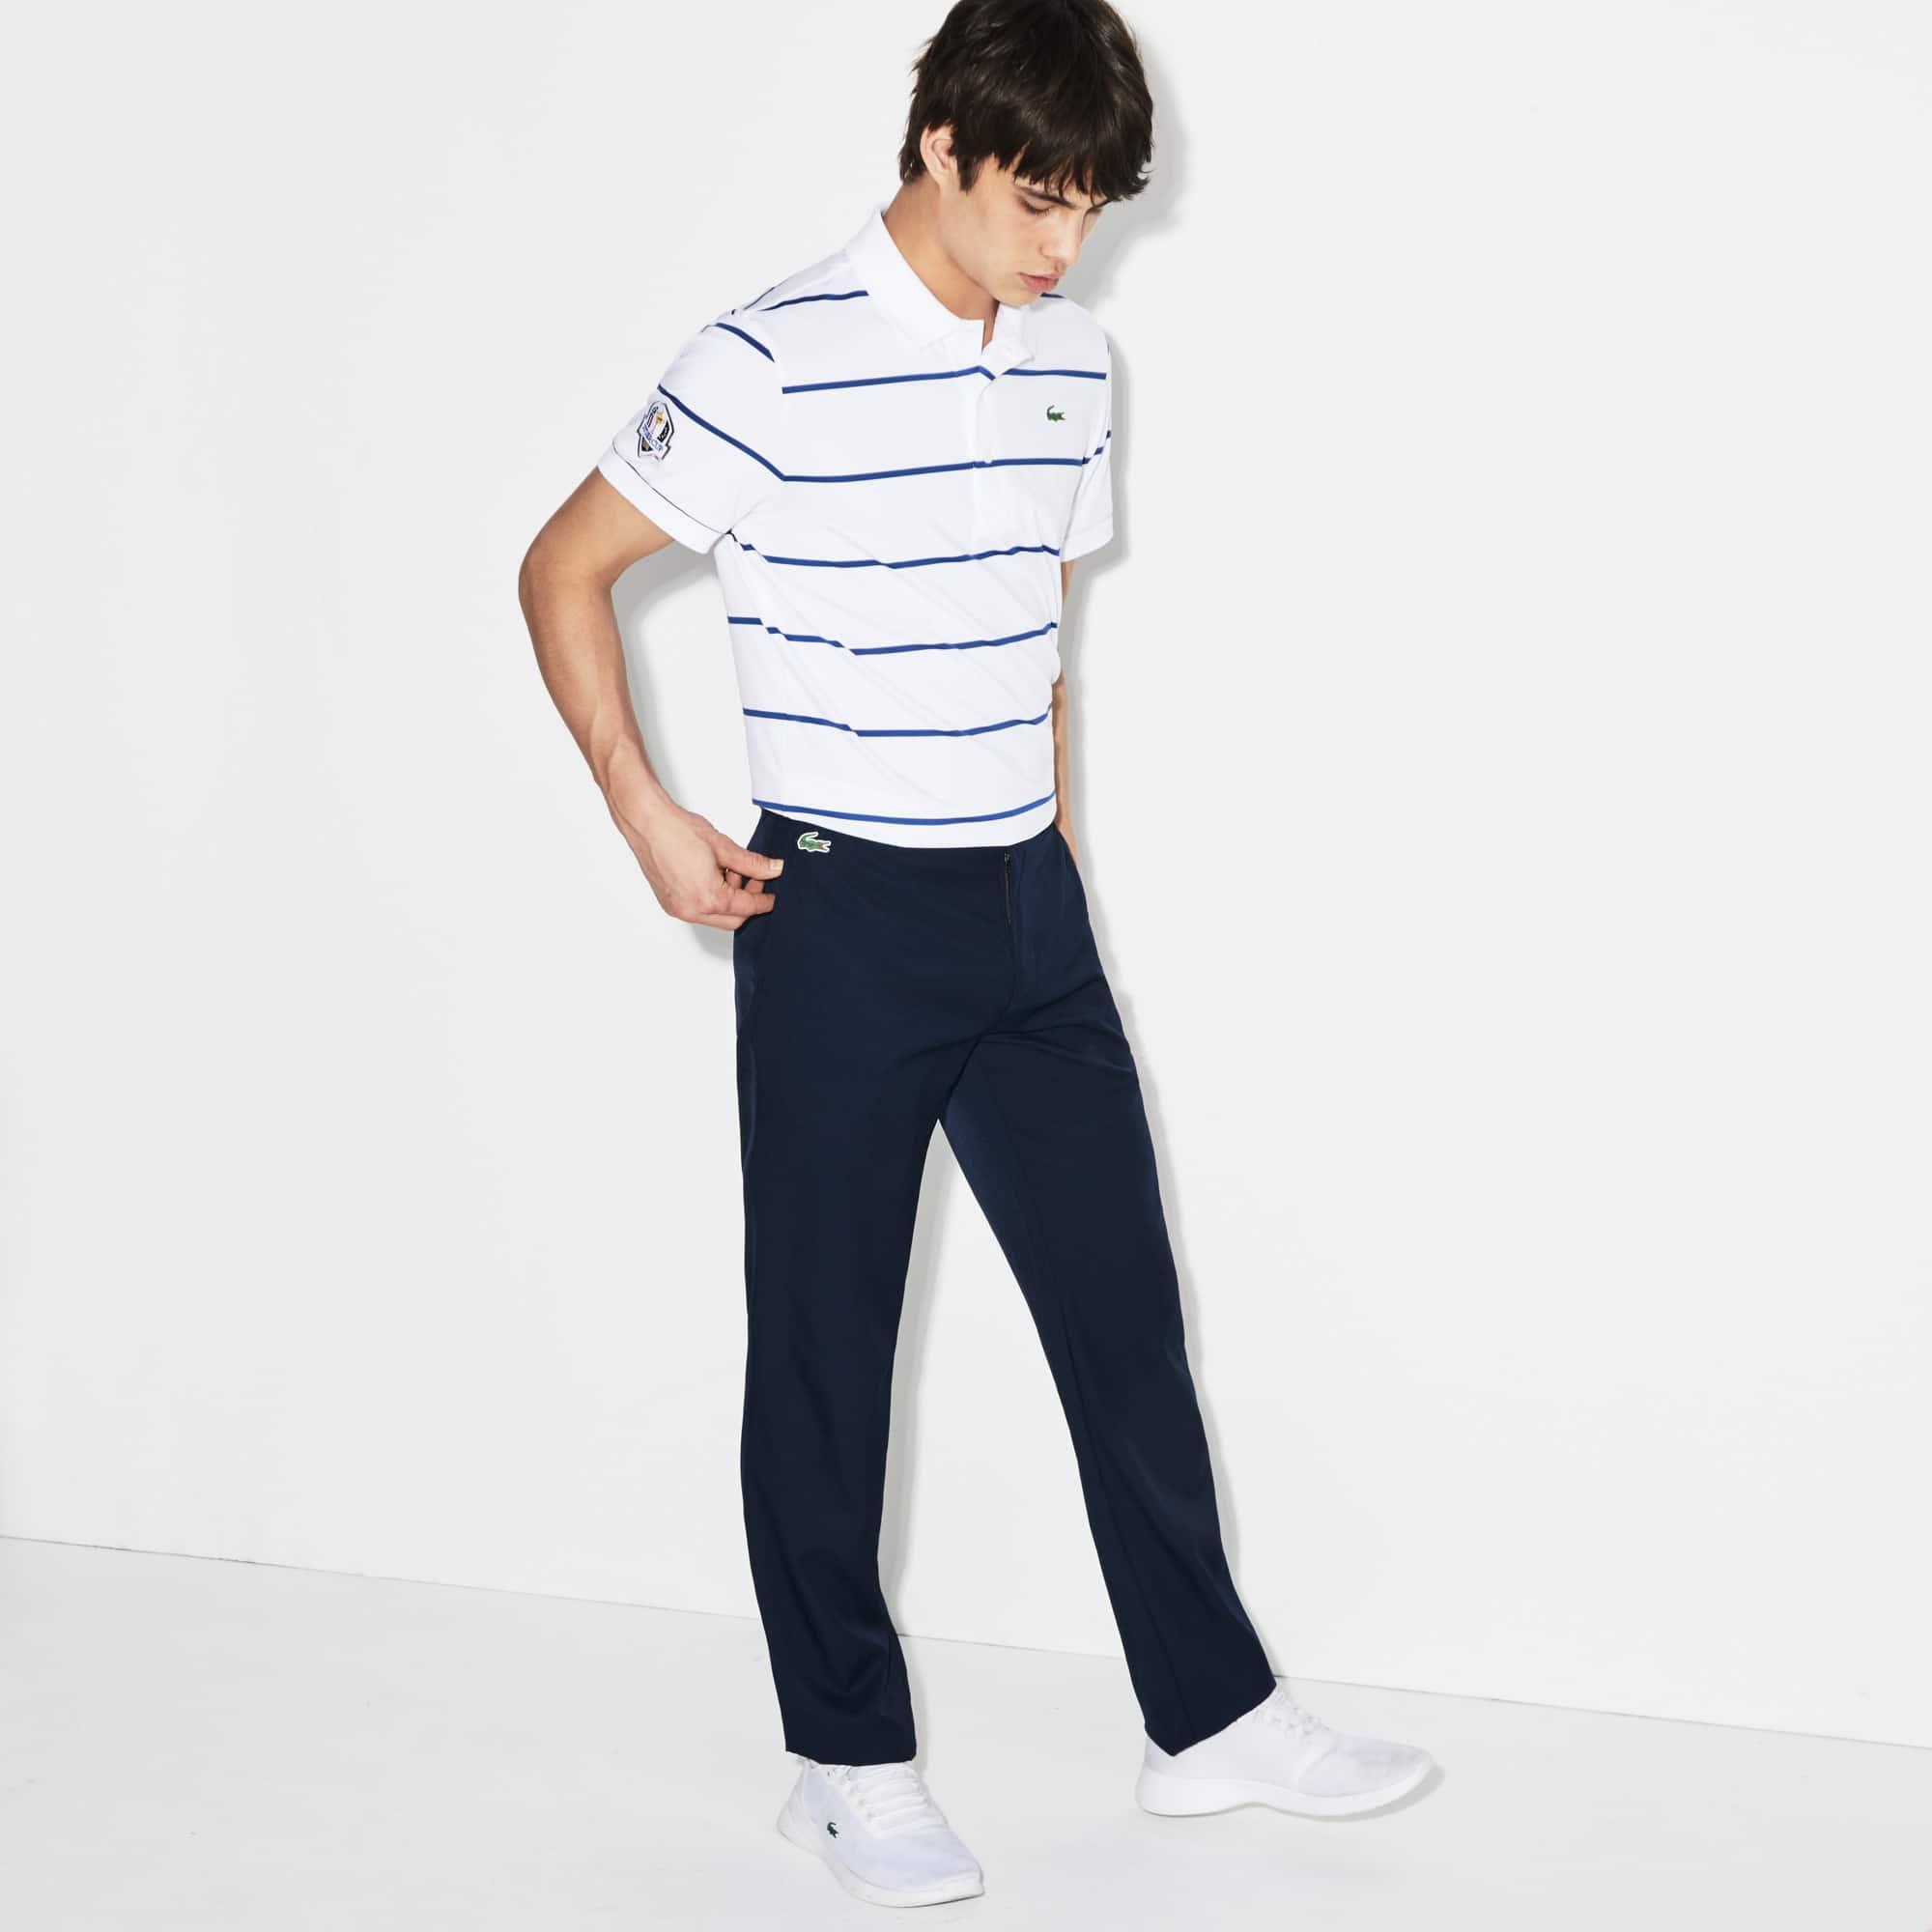 Pantaloni chinos Lacoste Golf in gabardine tecnico in tinta unita